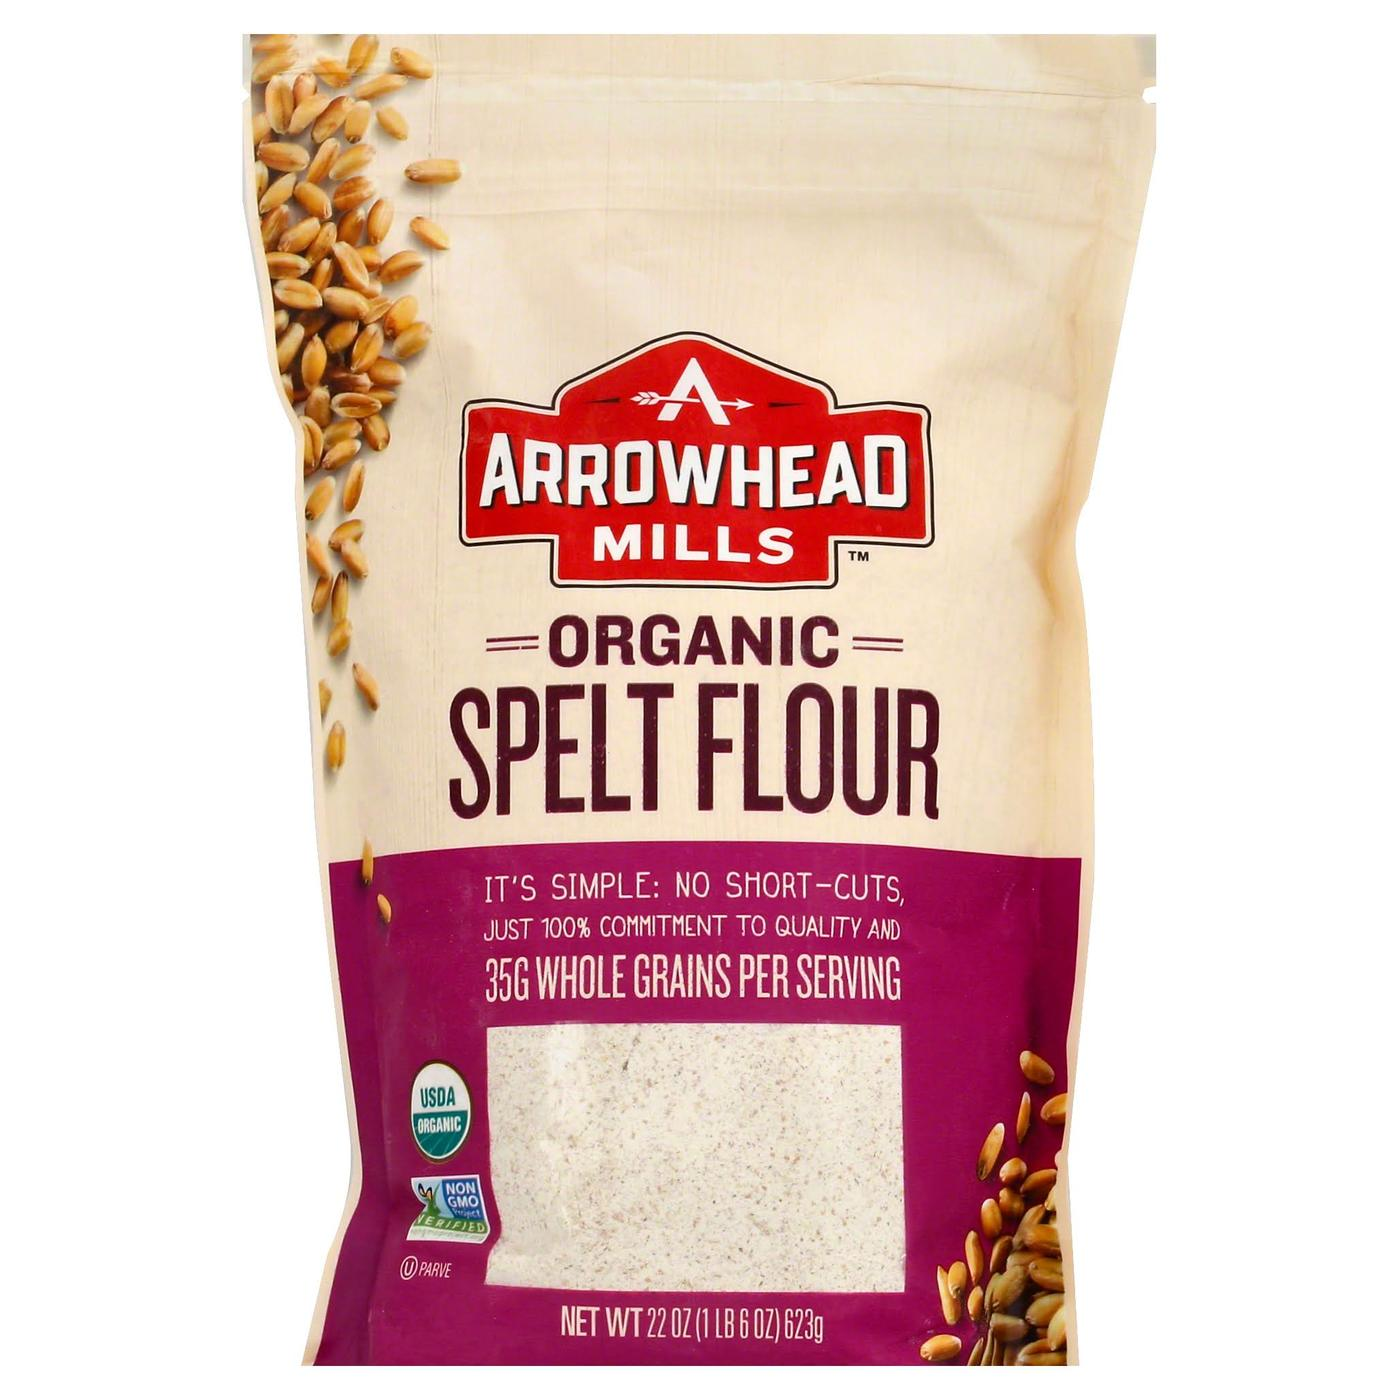 Arrowhead Mills Spelt Flour, Organic - 22 oz - eVitamins.com